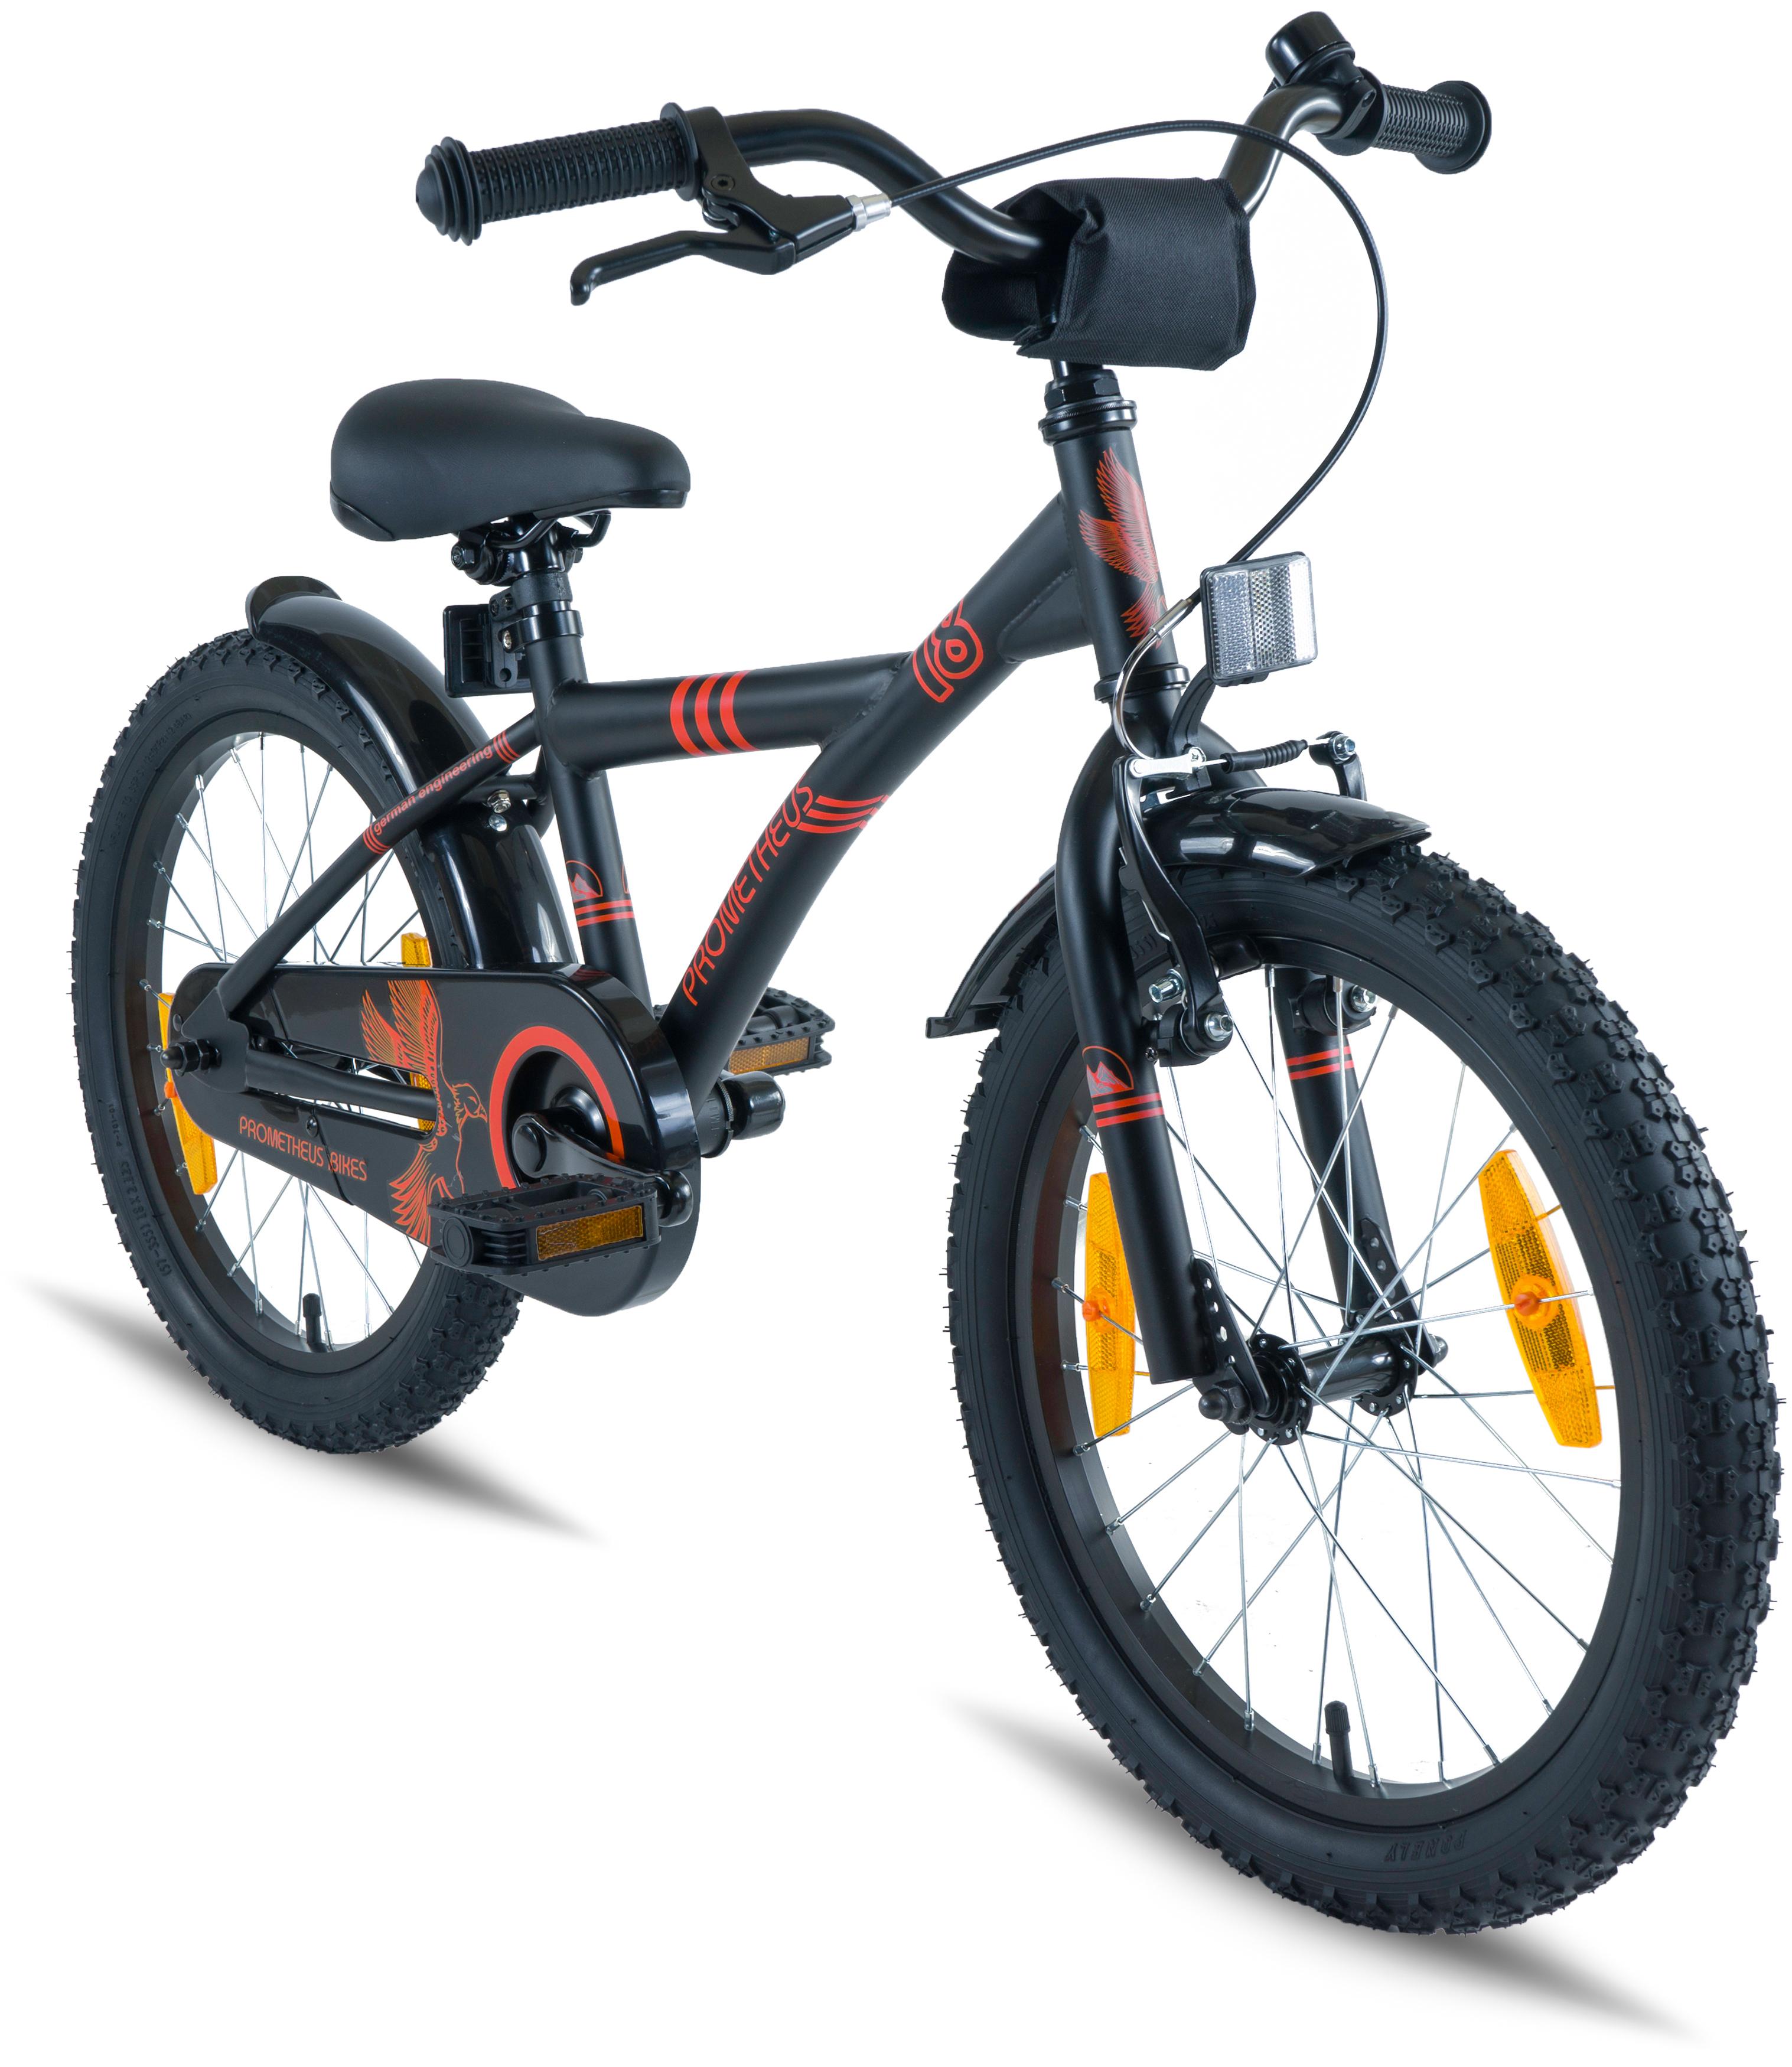 kinderfahrrad online kaufen prometheus bikes. Black Bedroom Furniture Sets. Home Design Ideas